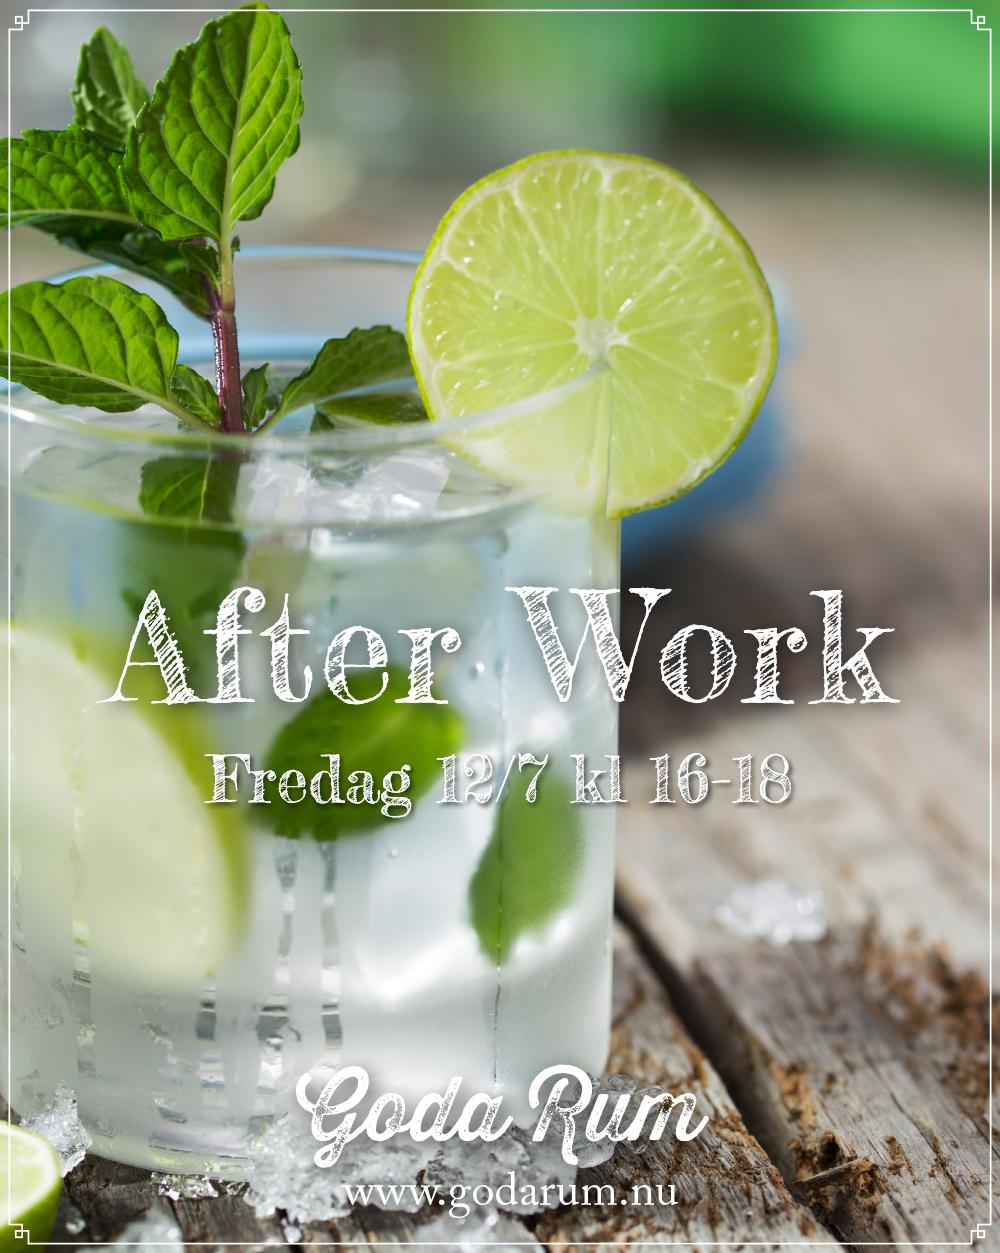 008_After Work_12juli